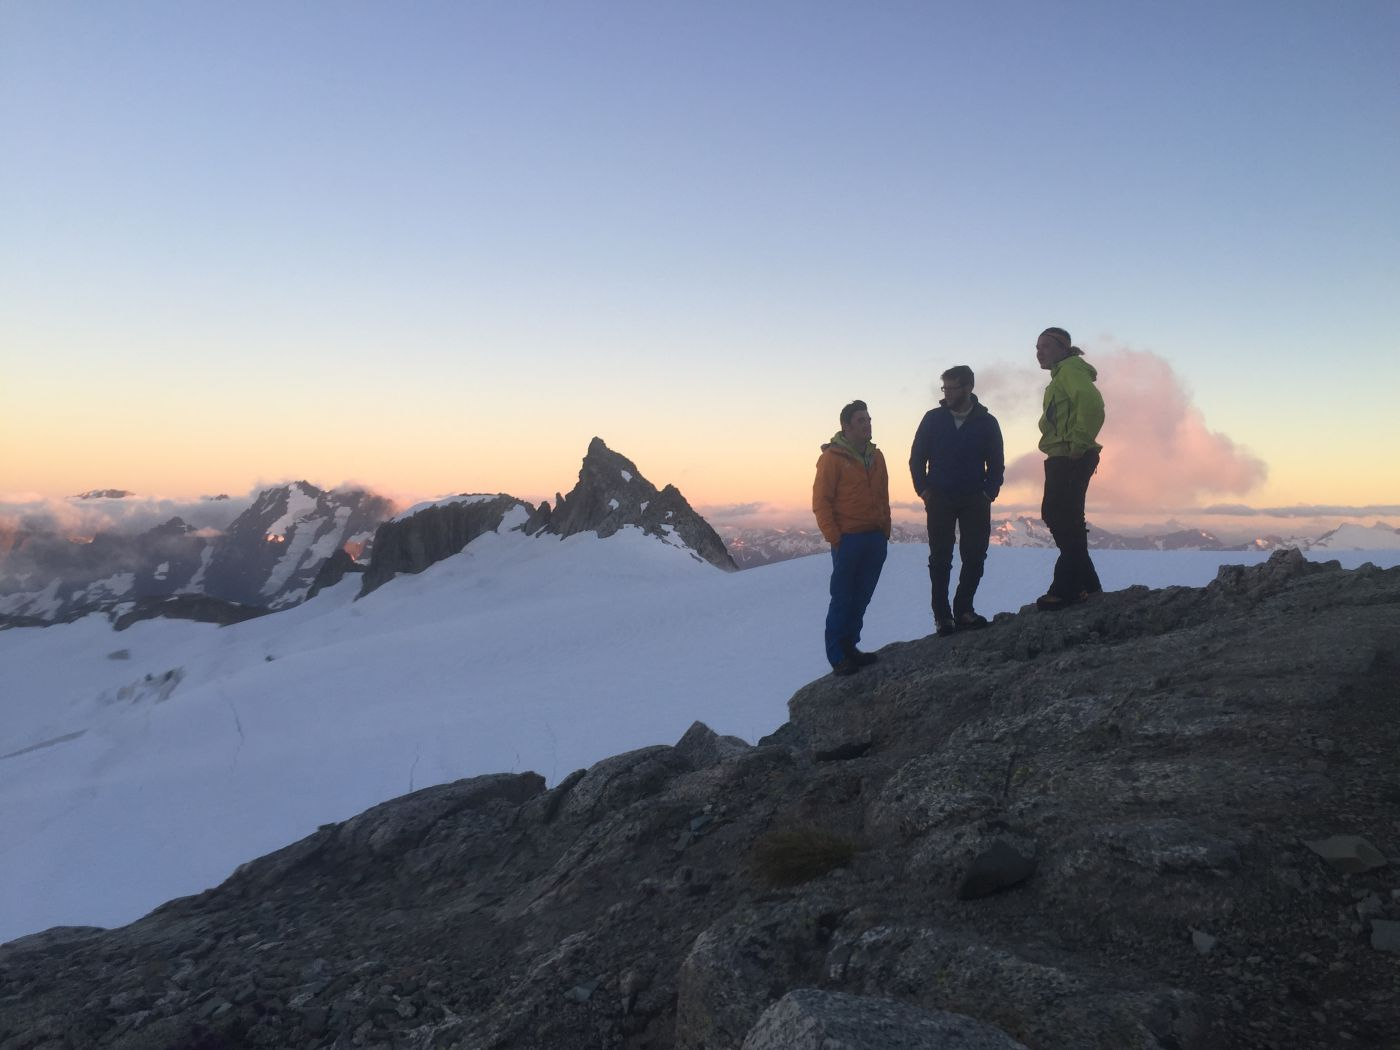 Peak 7 Outdoor Leadership Course